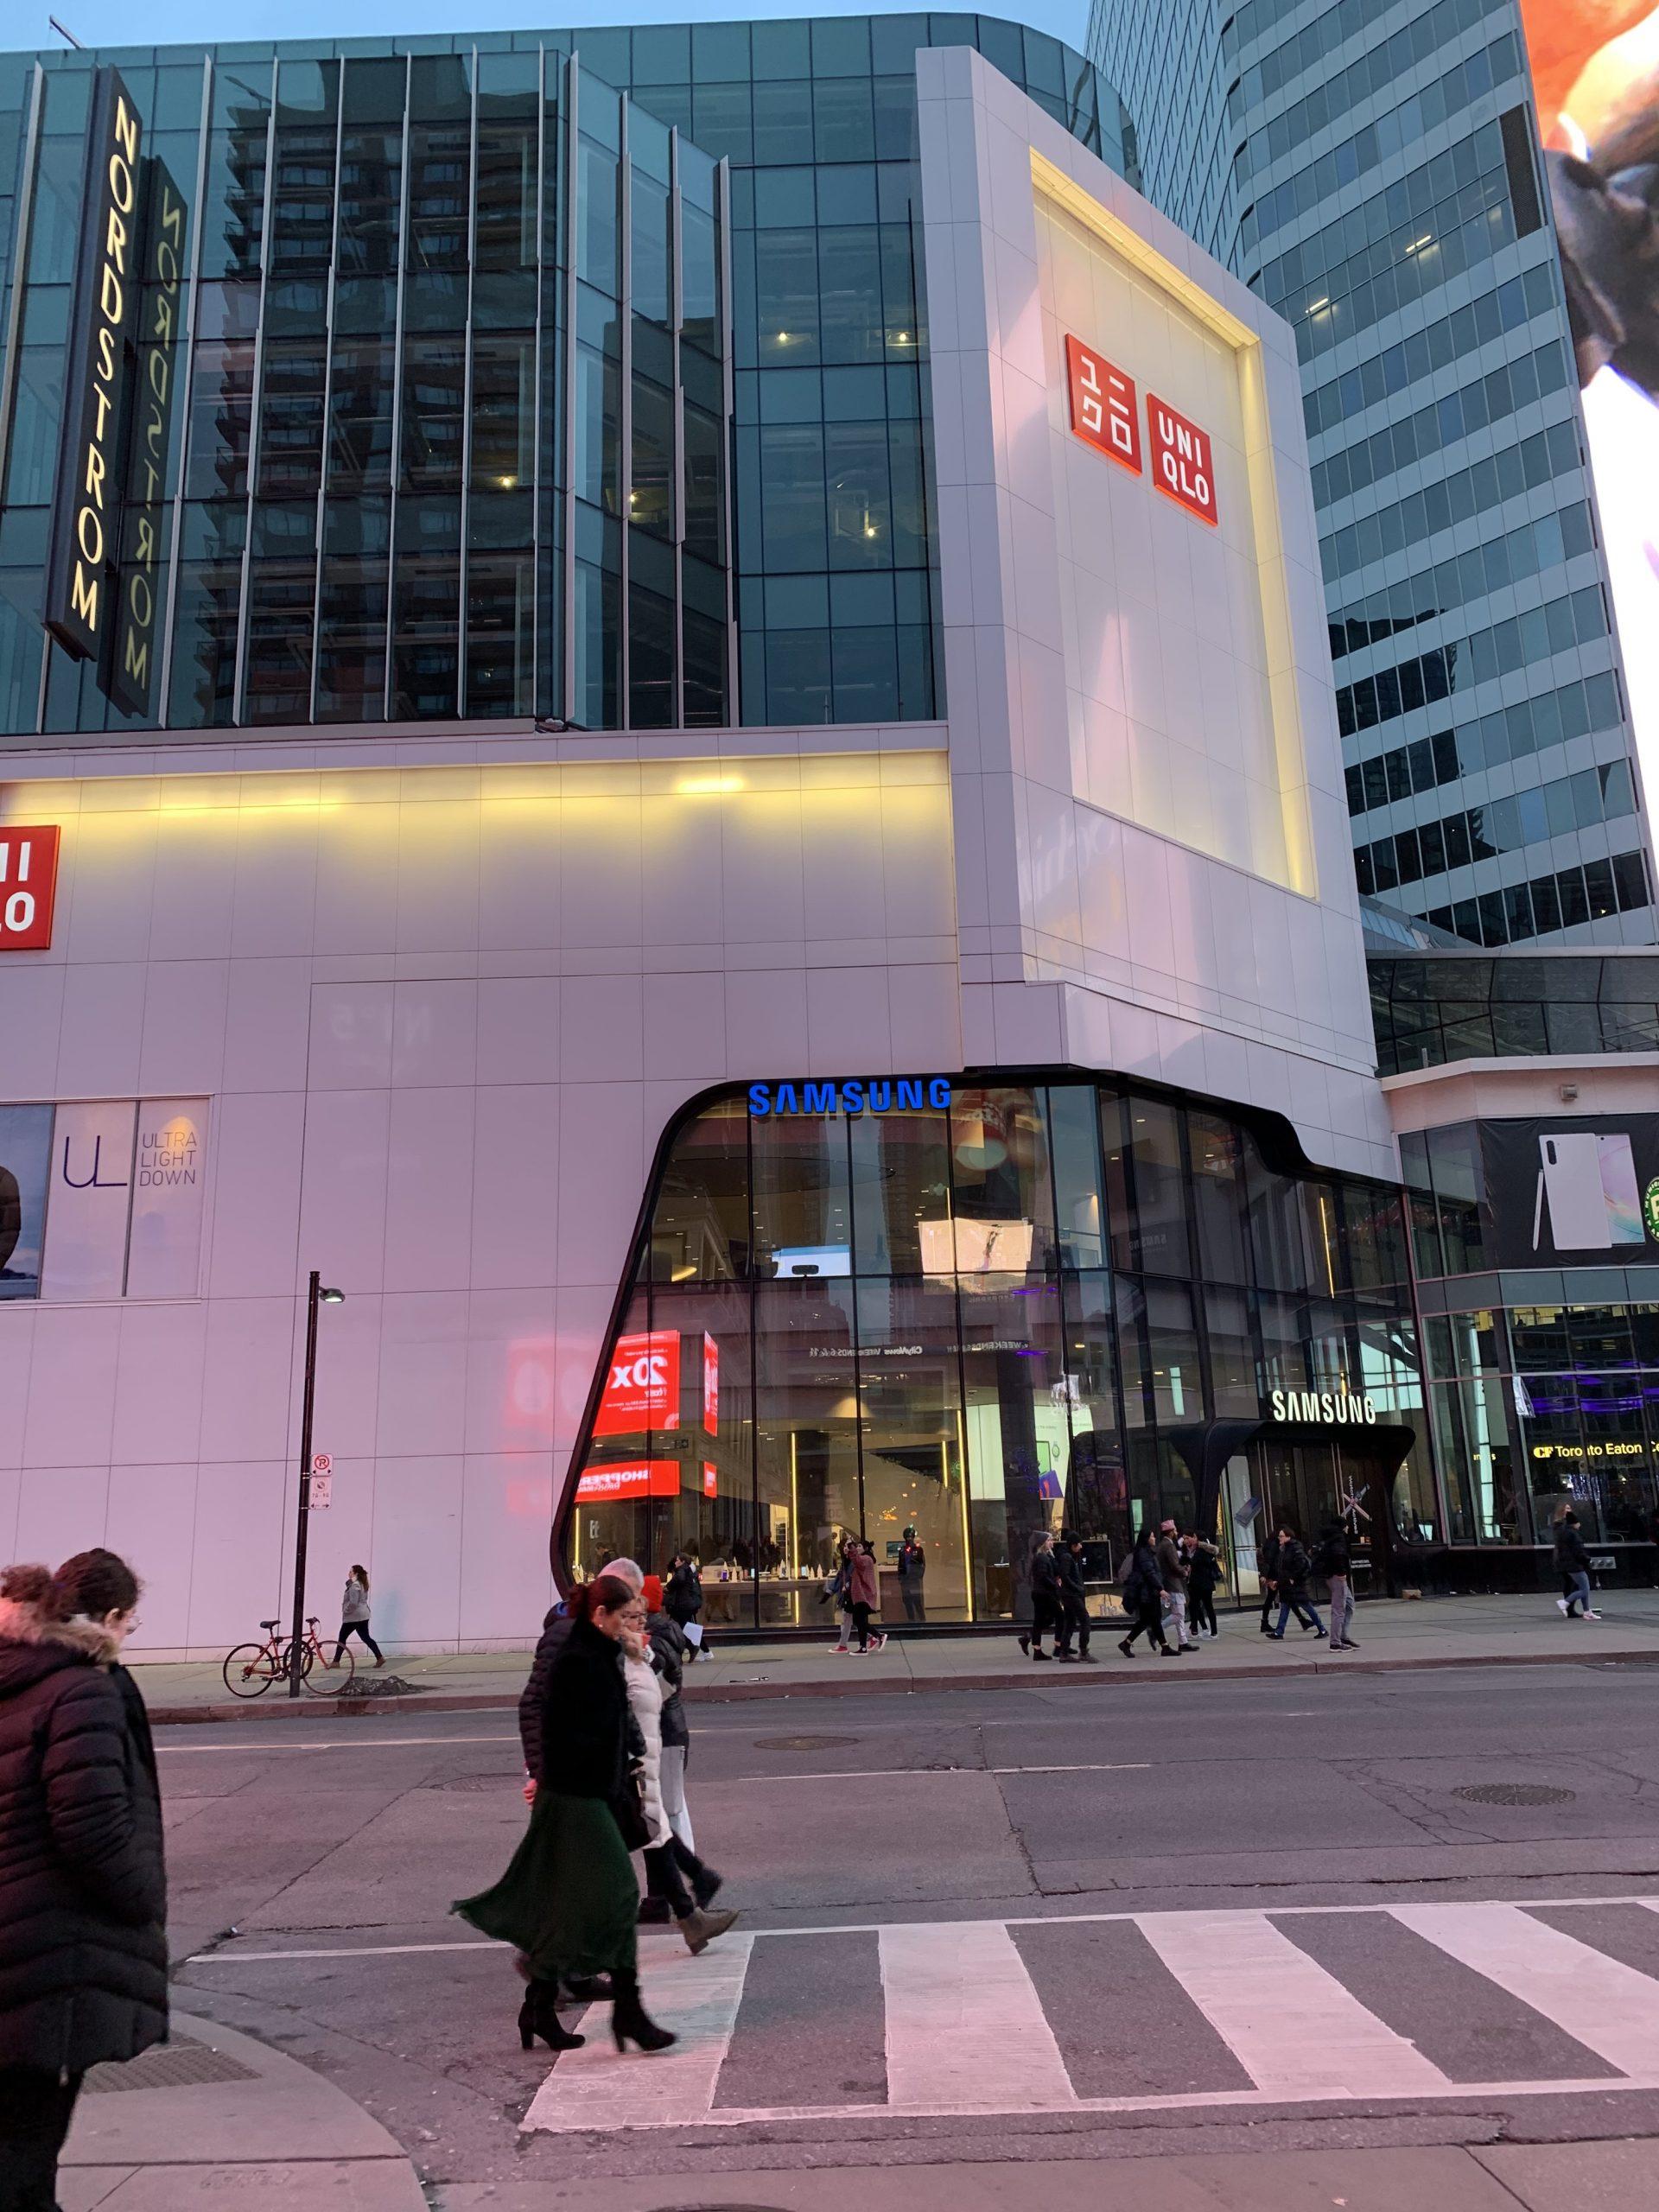 EXTERIOR - Samsung Toronto Eaton Centre